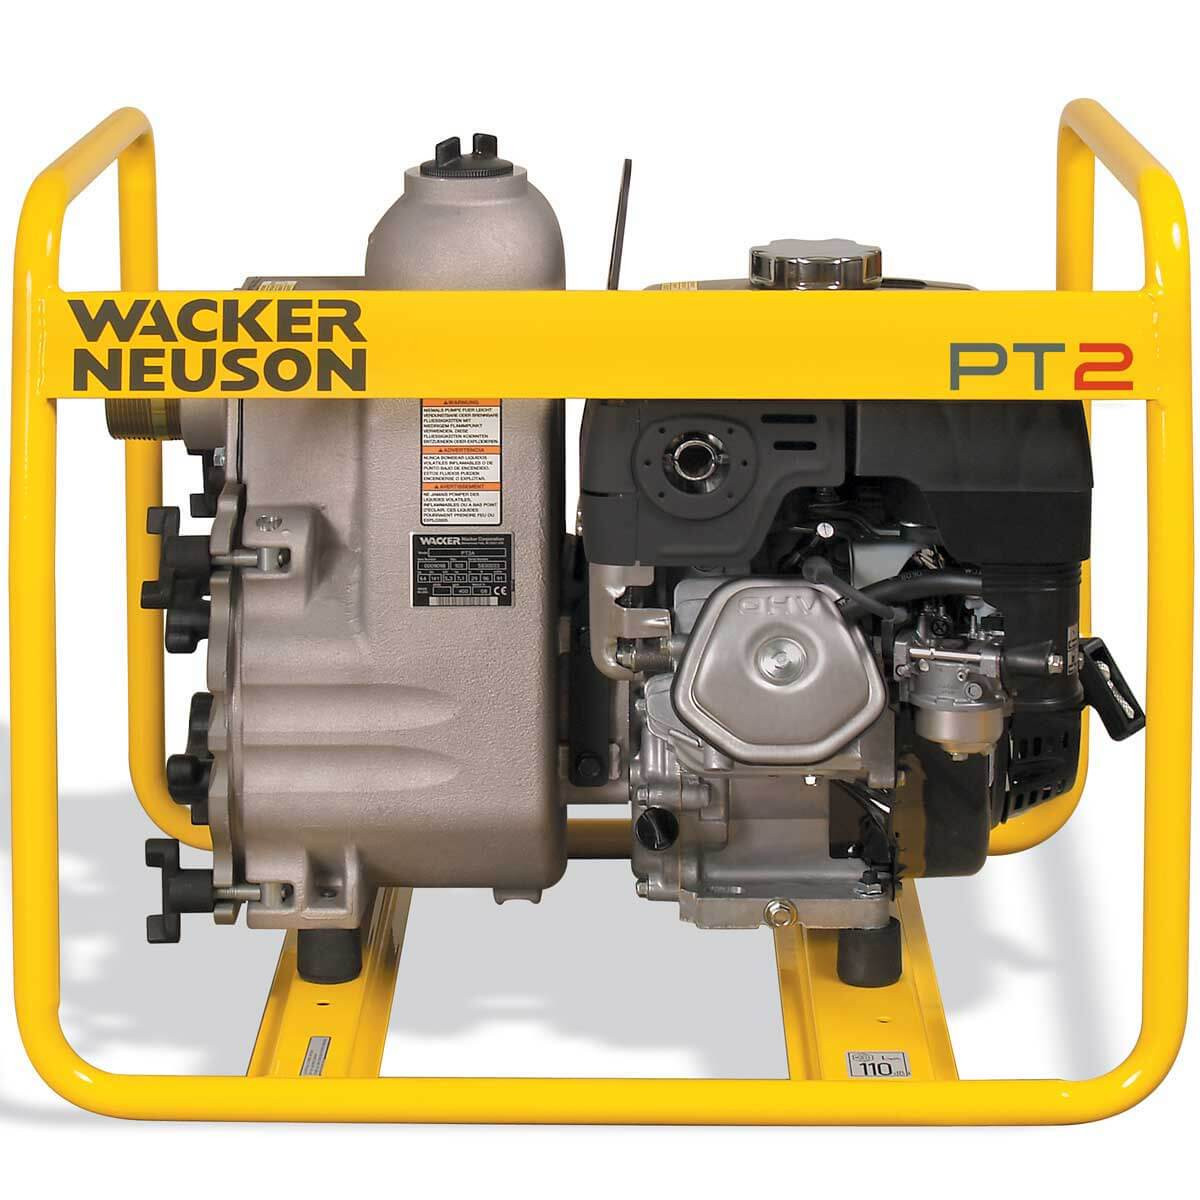 5000009092 2 inch Honda Gas Centrifugal Trash Pump PT2A